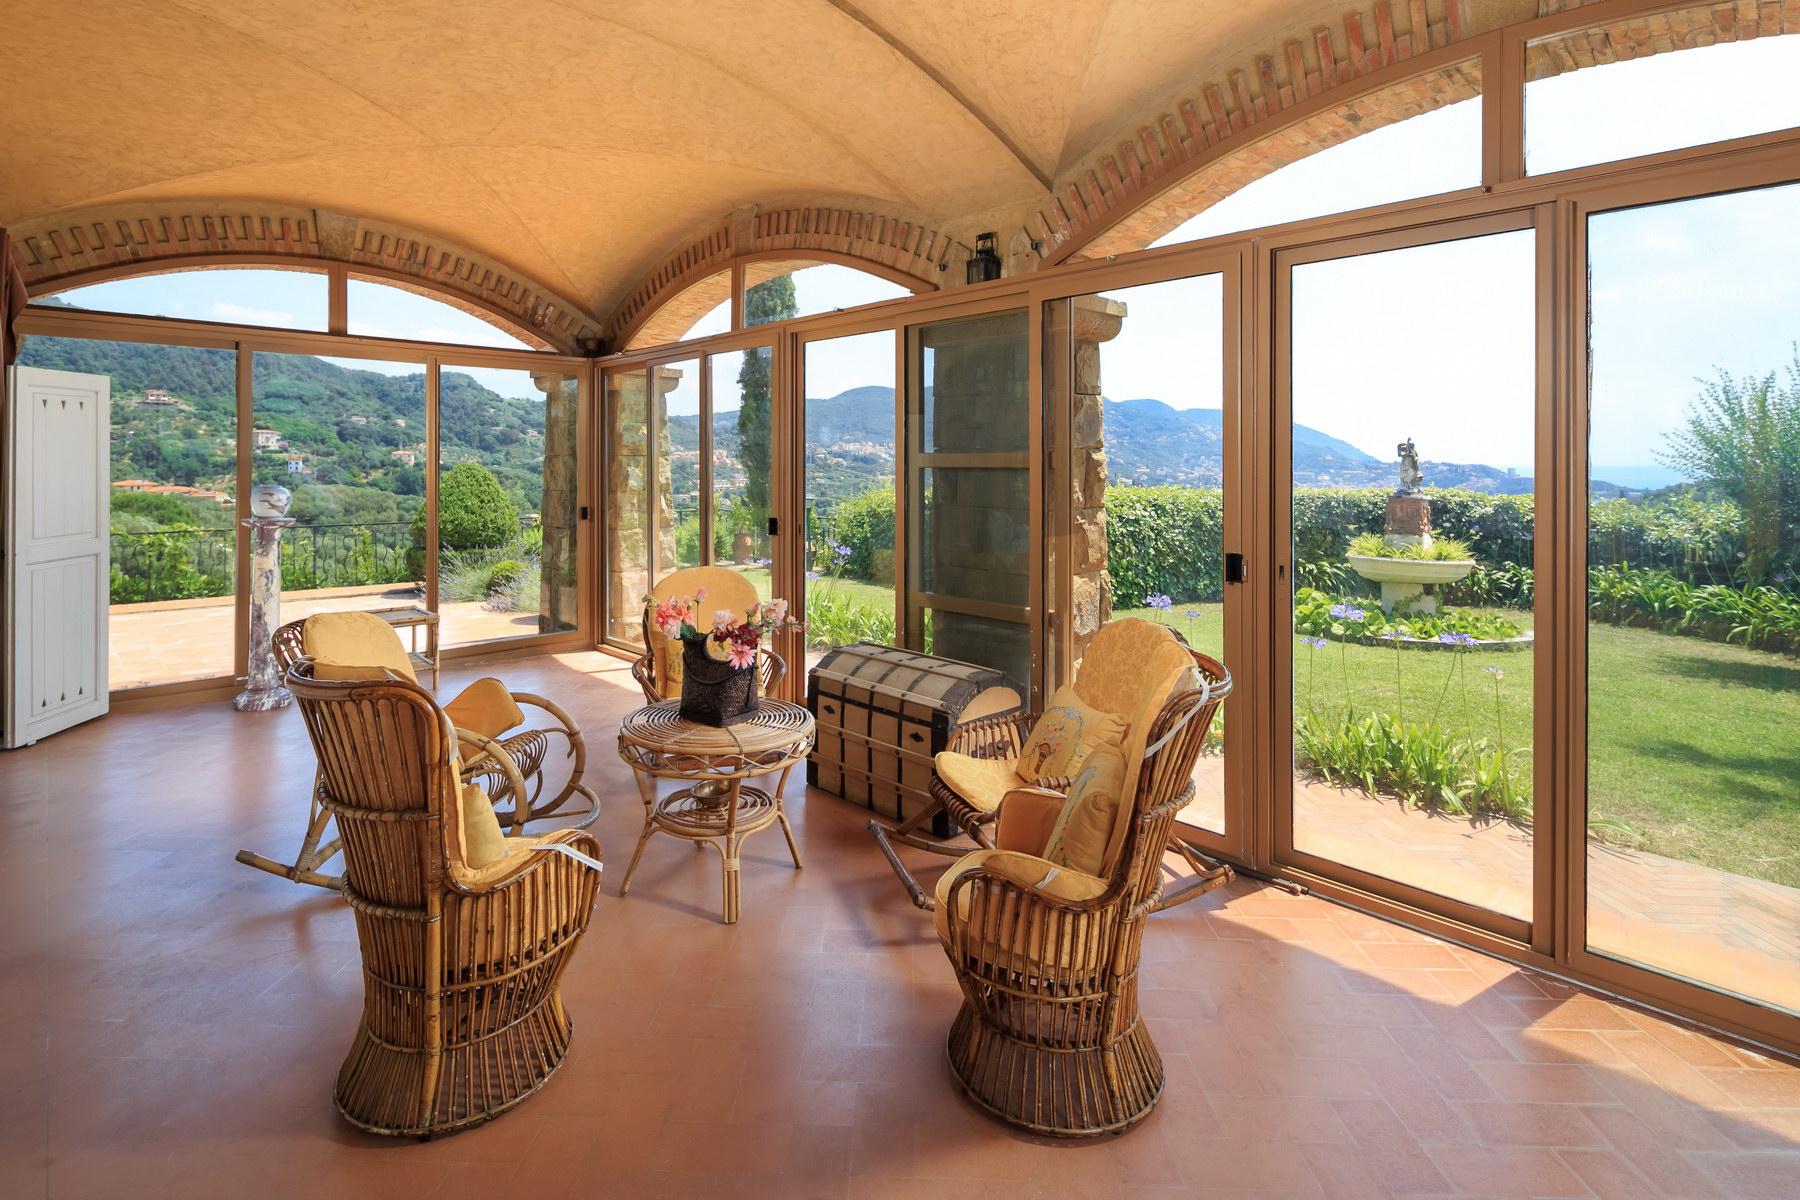 Villa in Vendita a Lerici: 5 locali, 620 mq - Foto 11